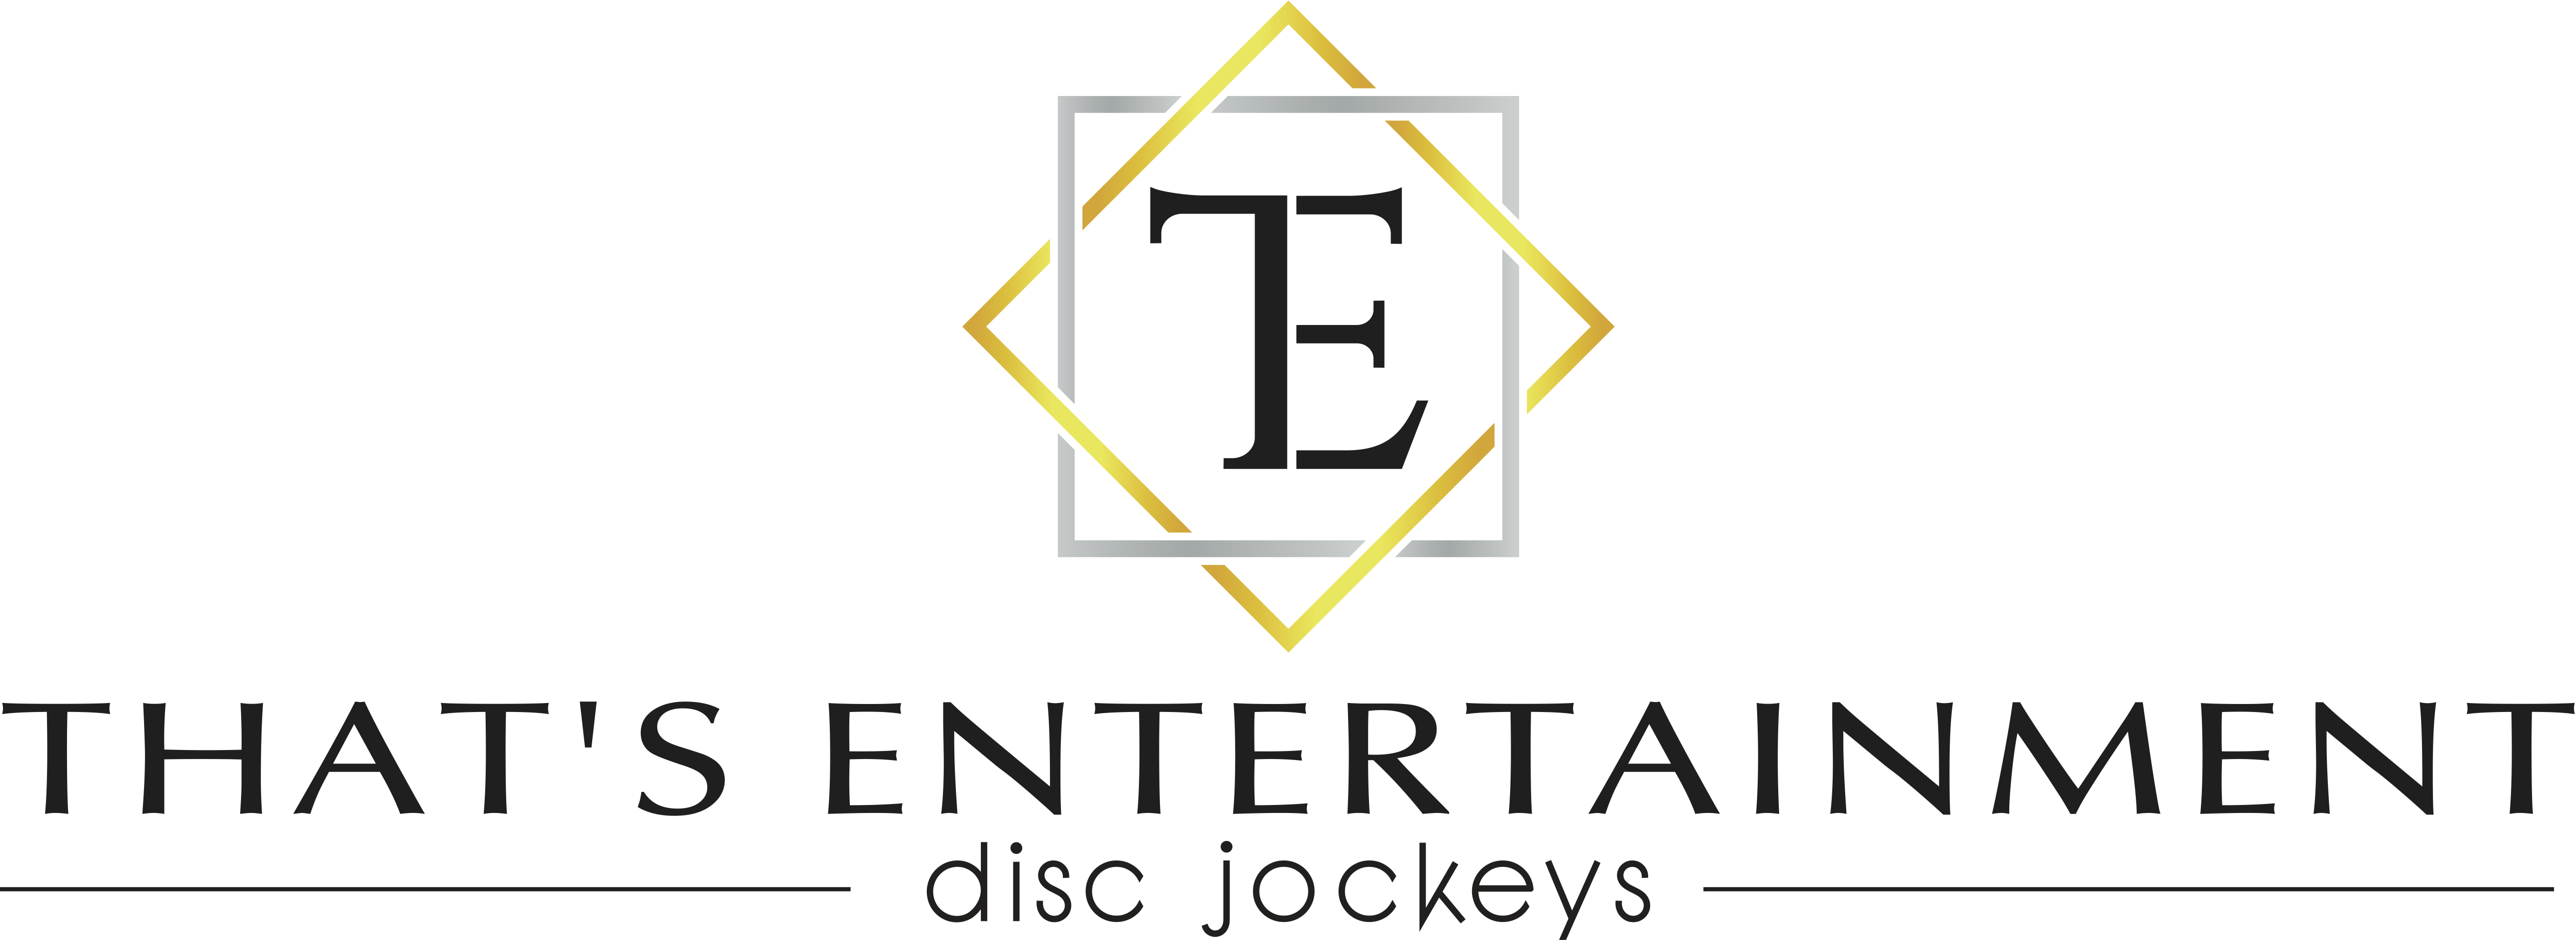 That's Entertainment Disc Jockeys Logo